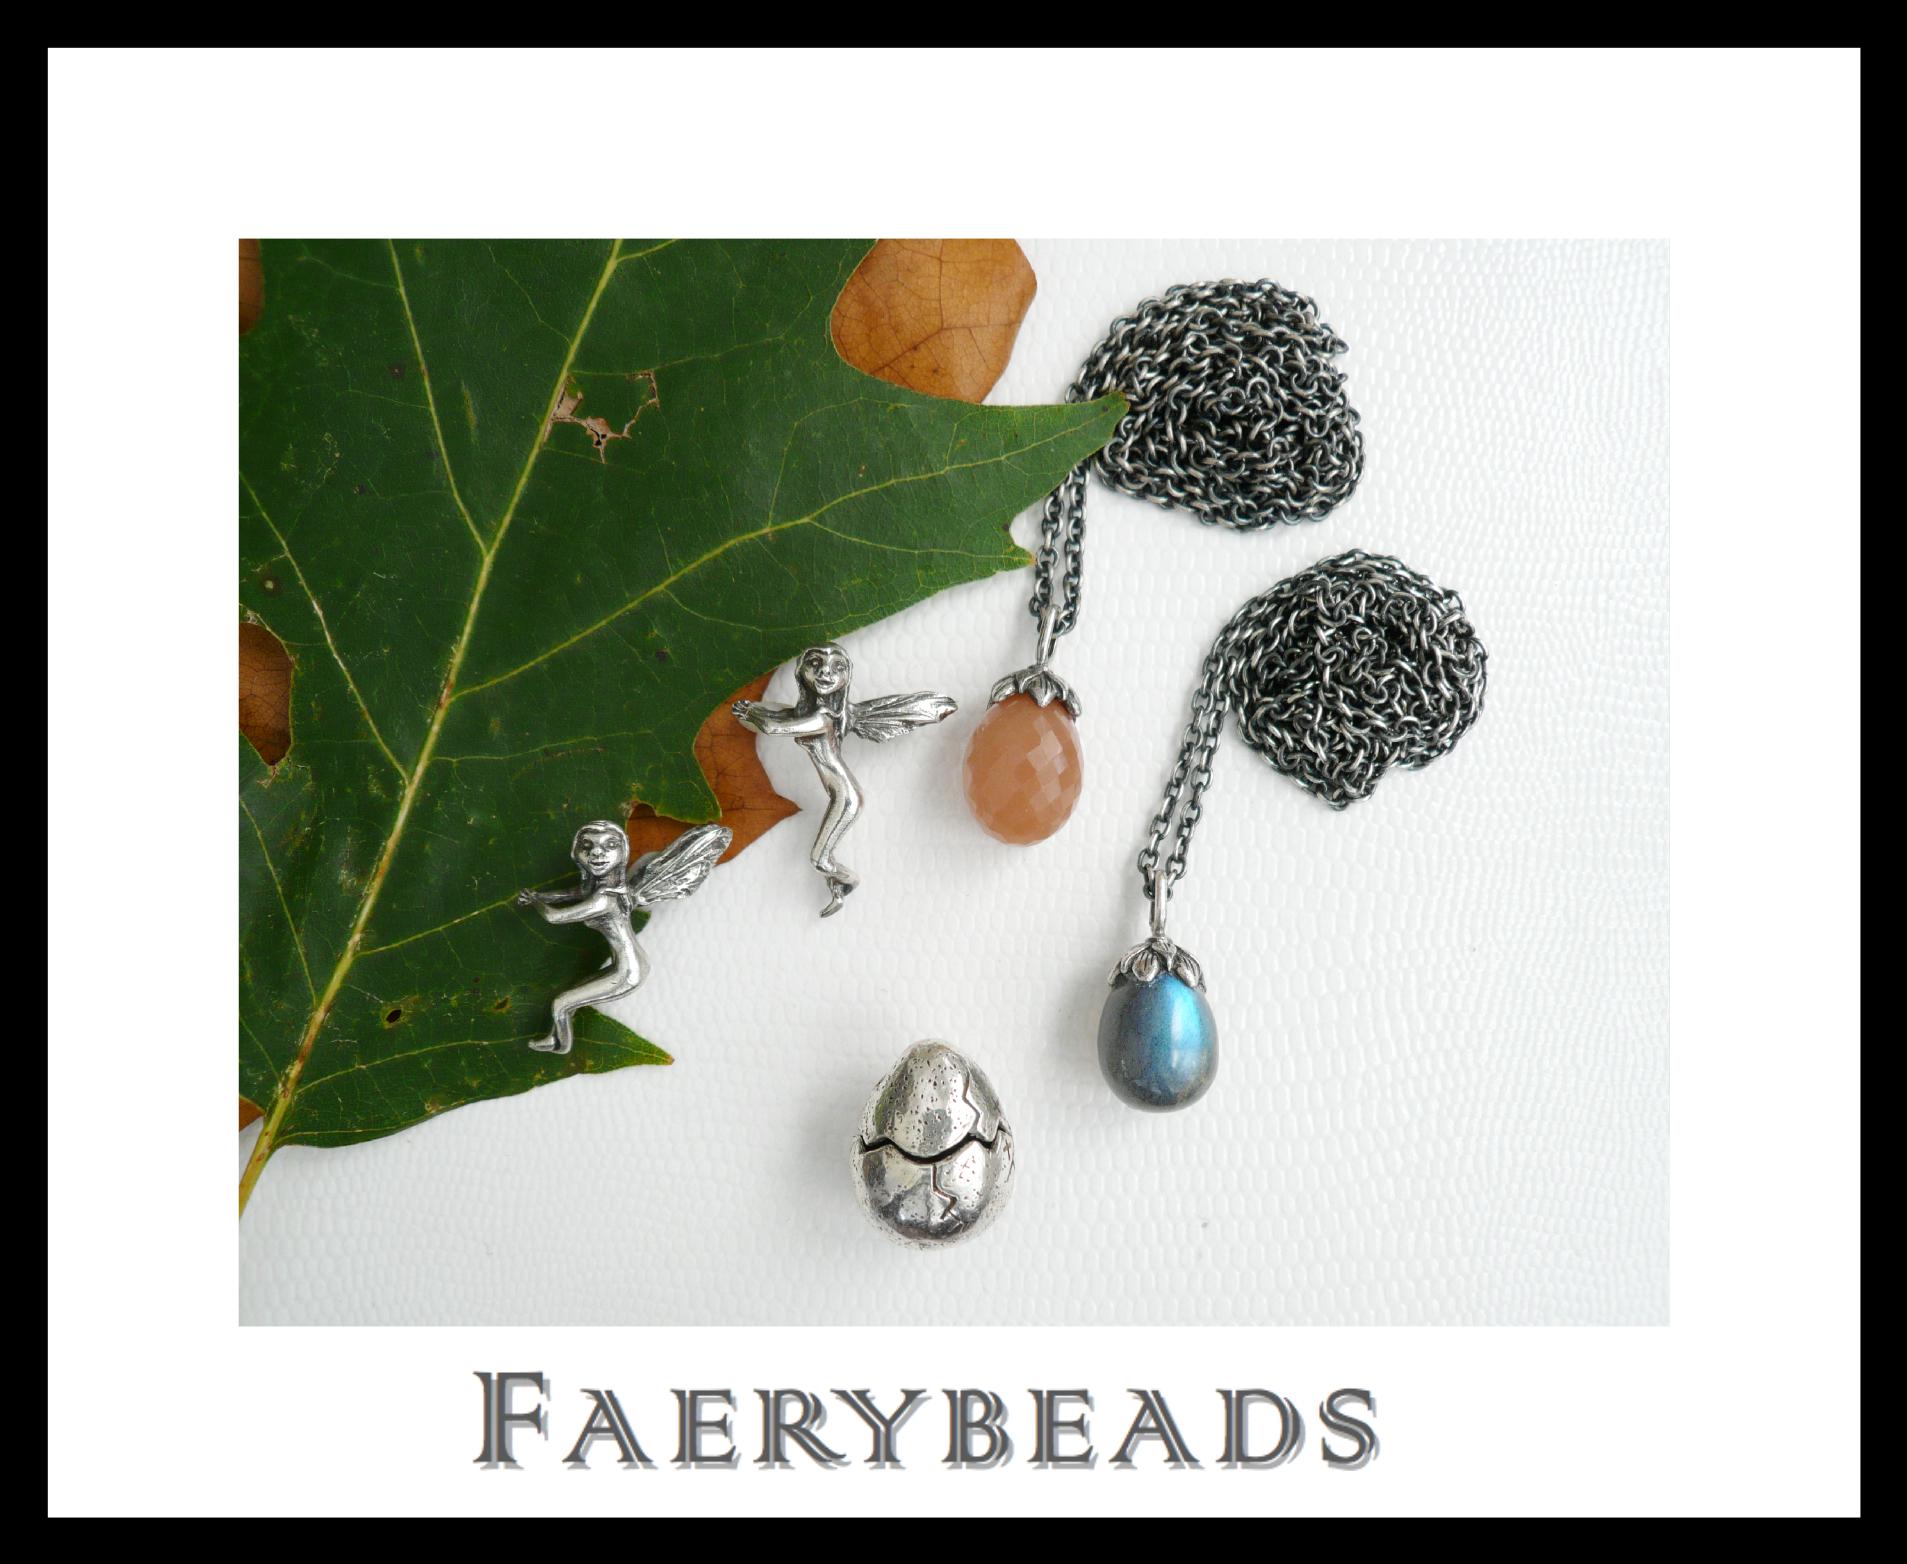 Faerybeads Fall 2012 FaerybeadsFall2012_zps4d8a0ebd